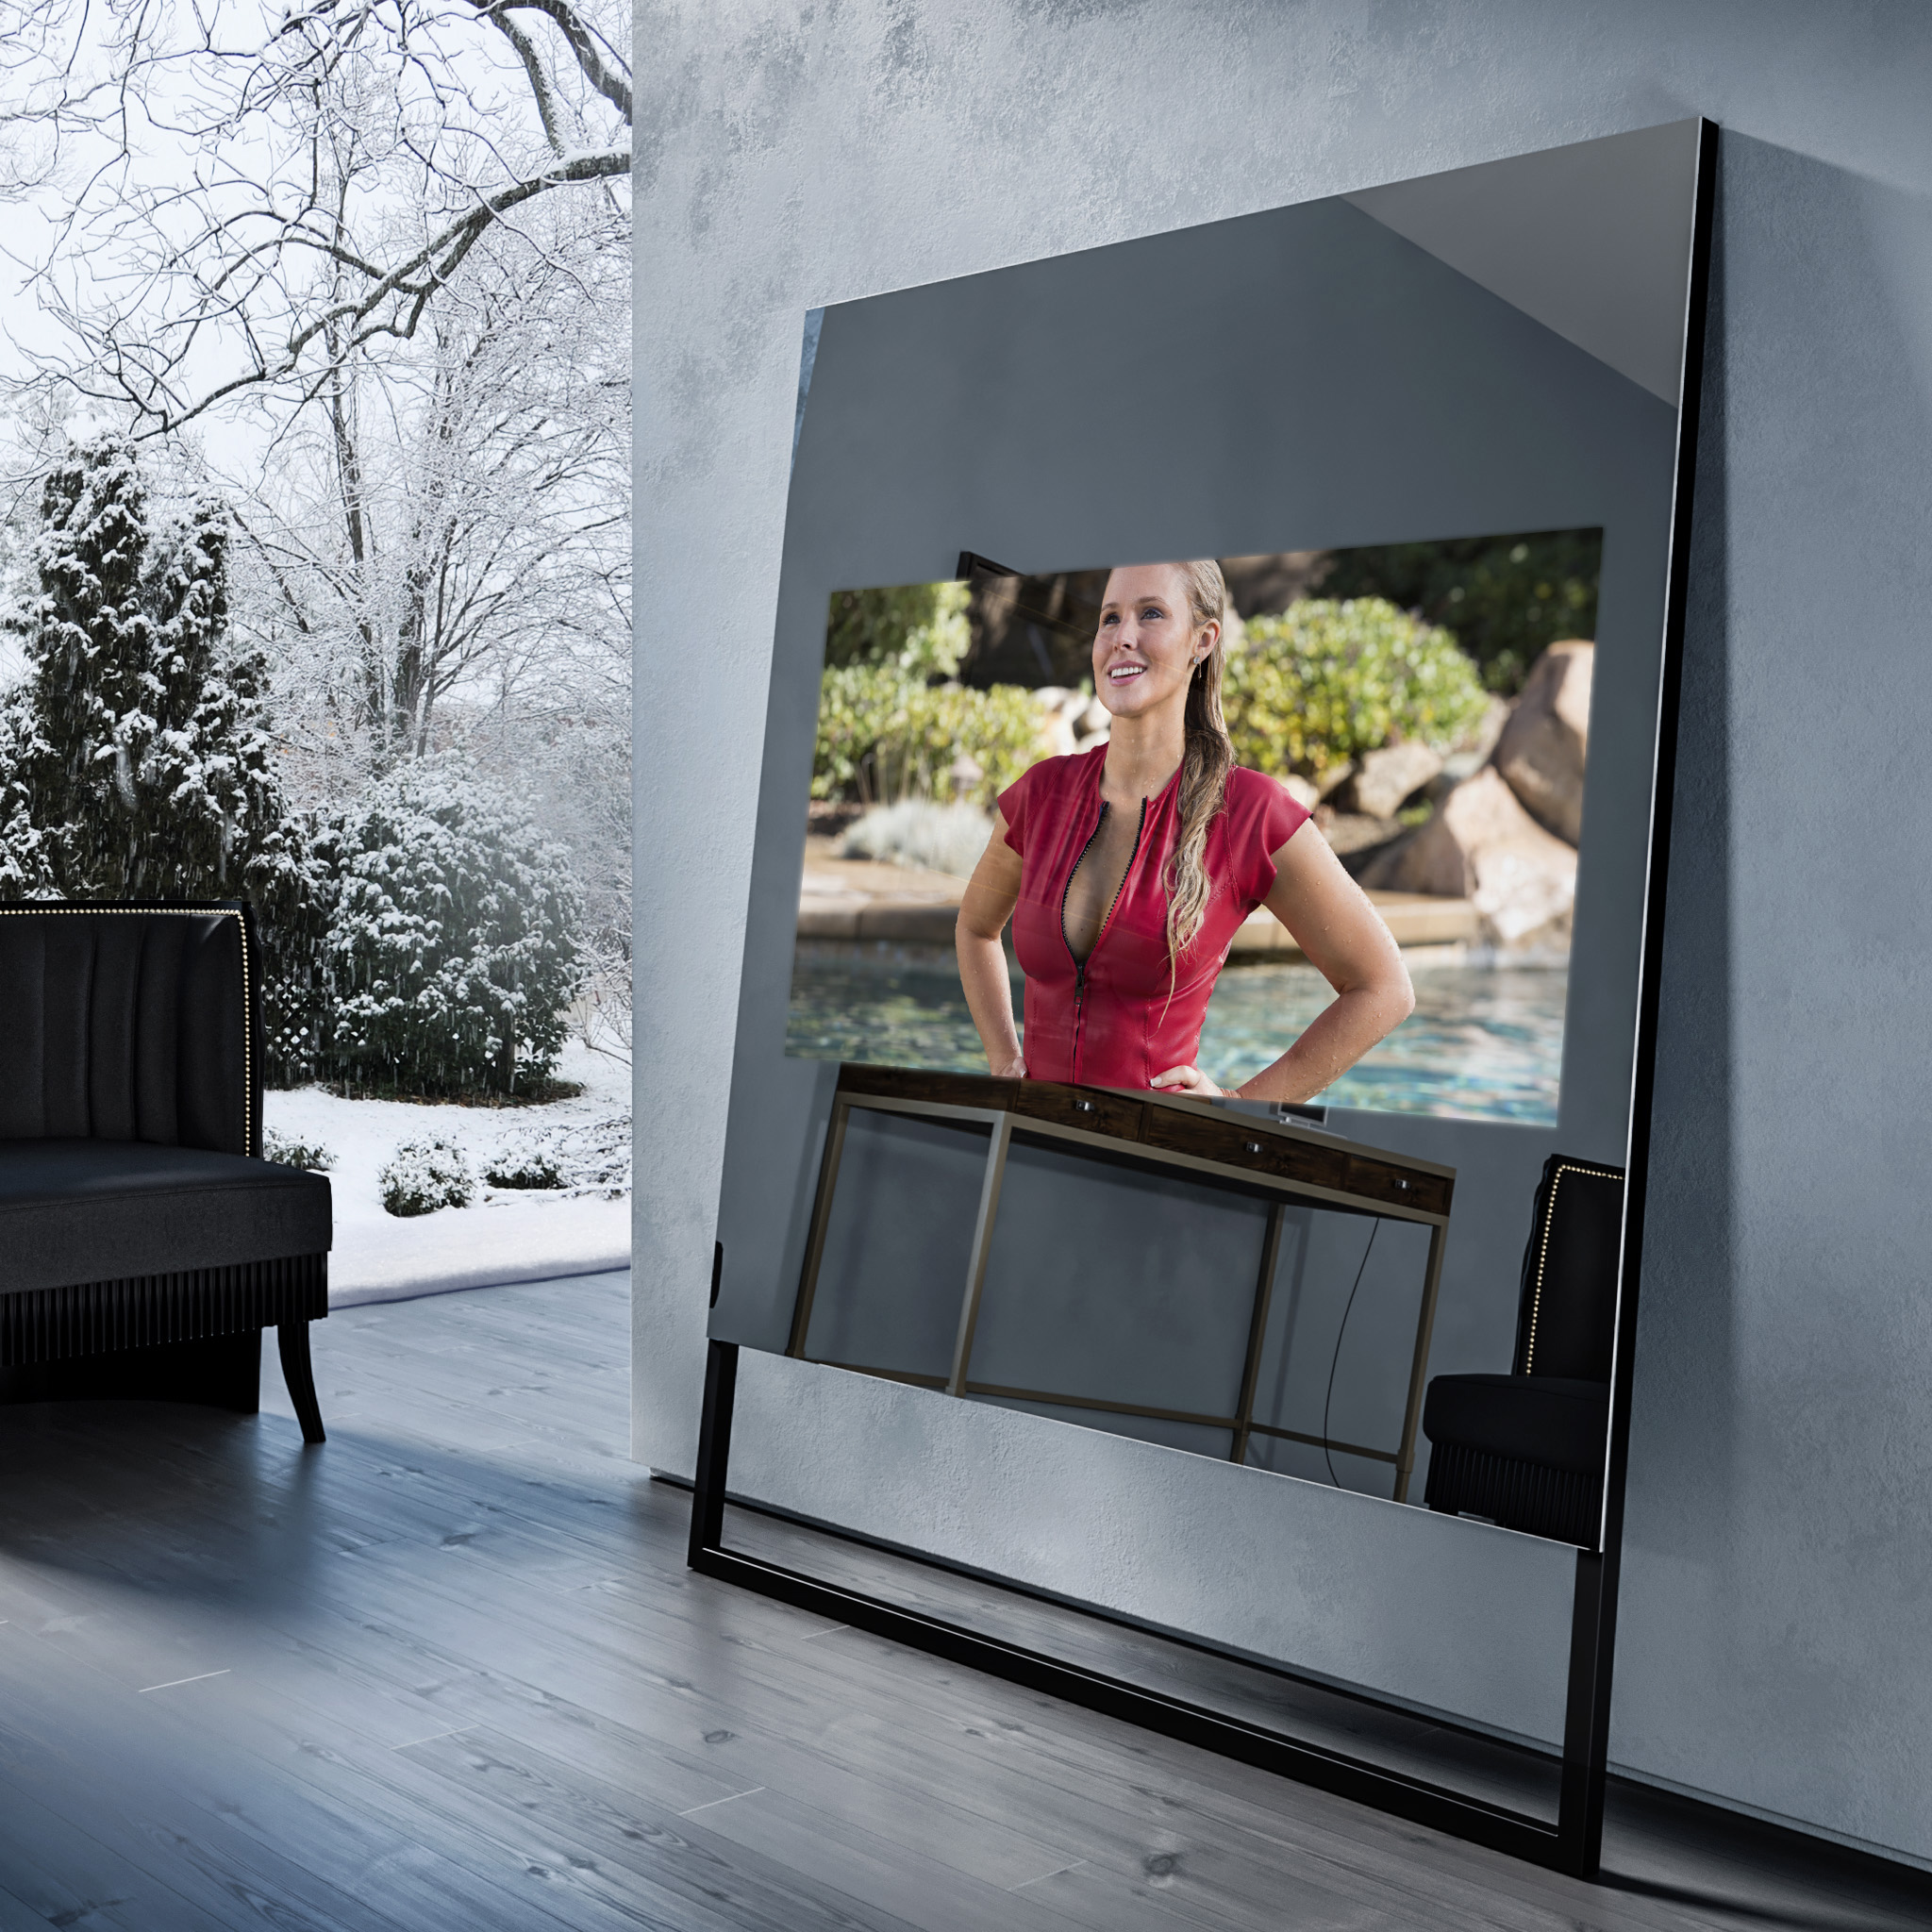 Зеркальный телевизор Tele-Art Soft Minimalism Grafit Mirror